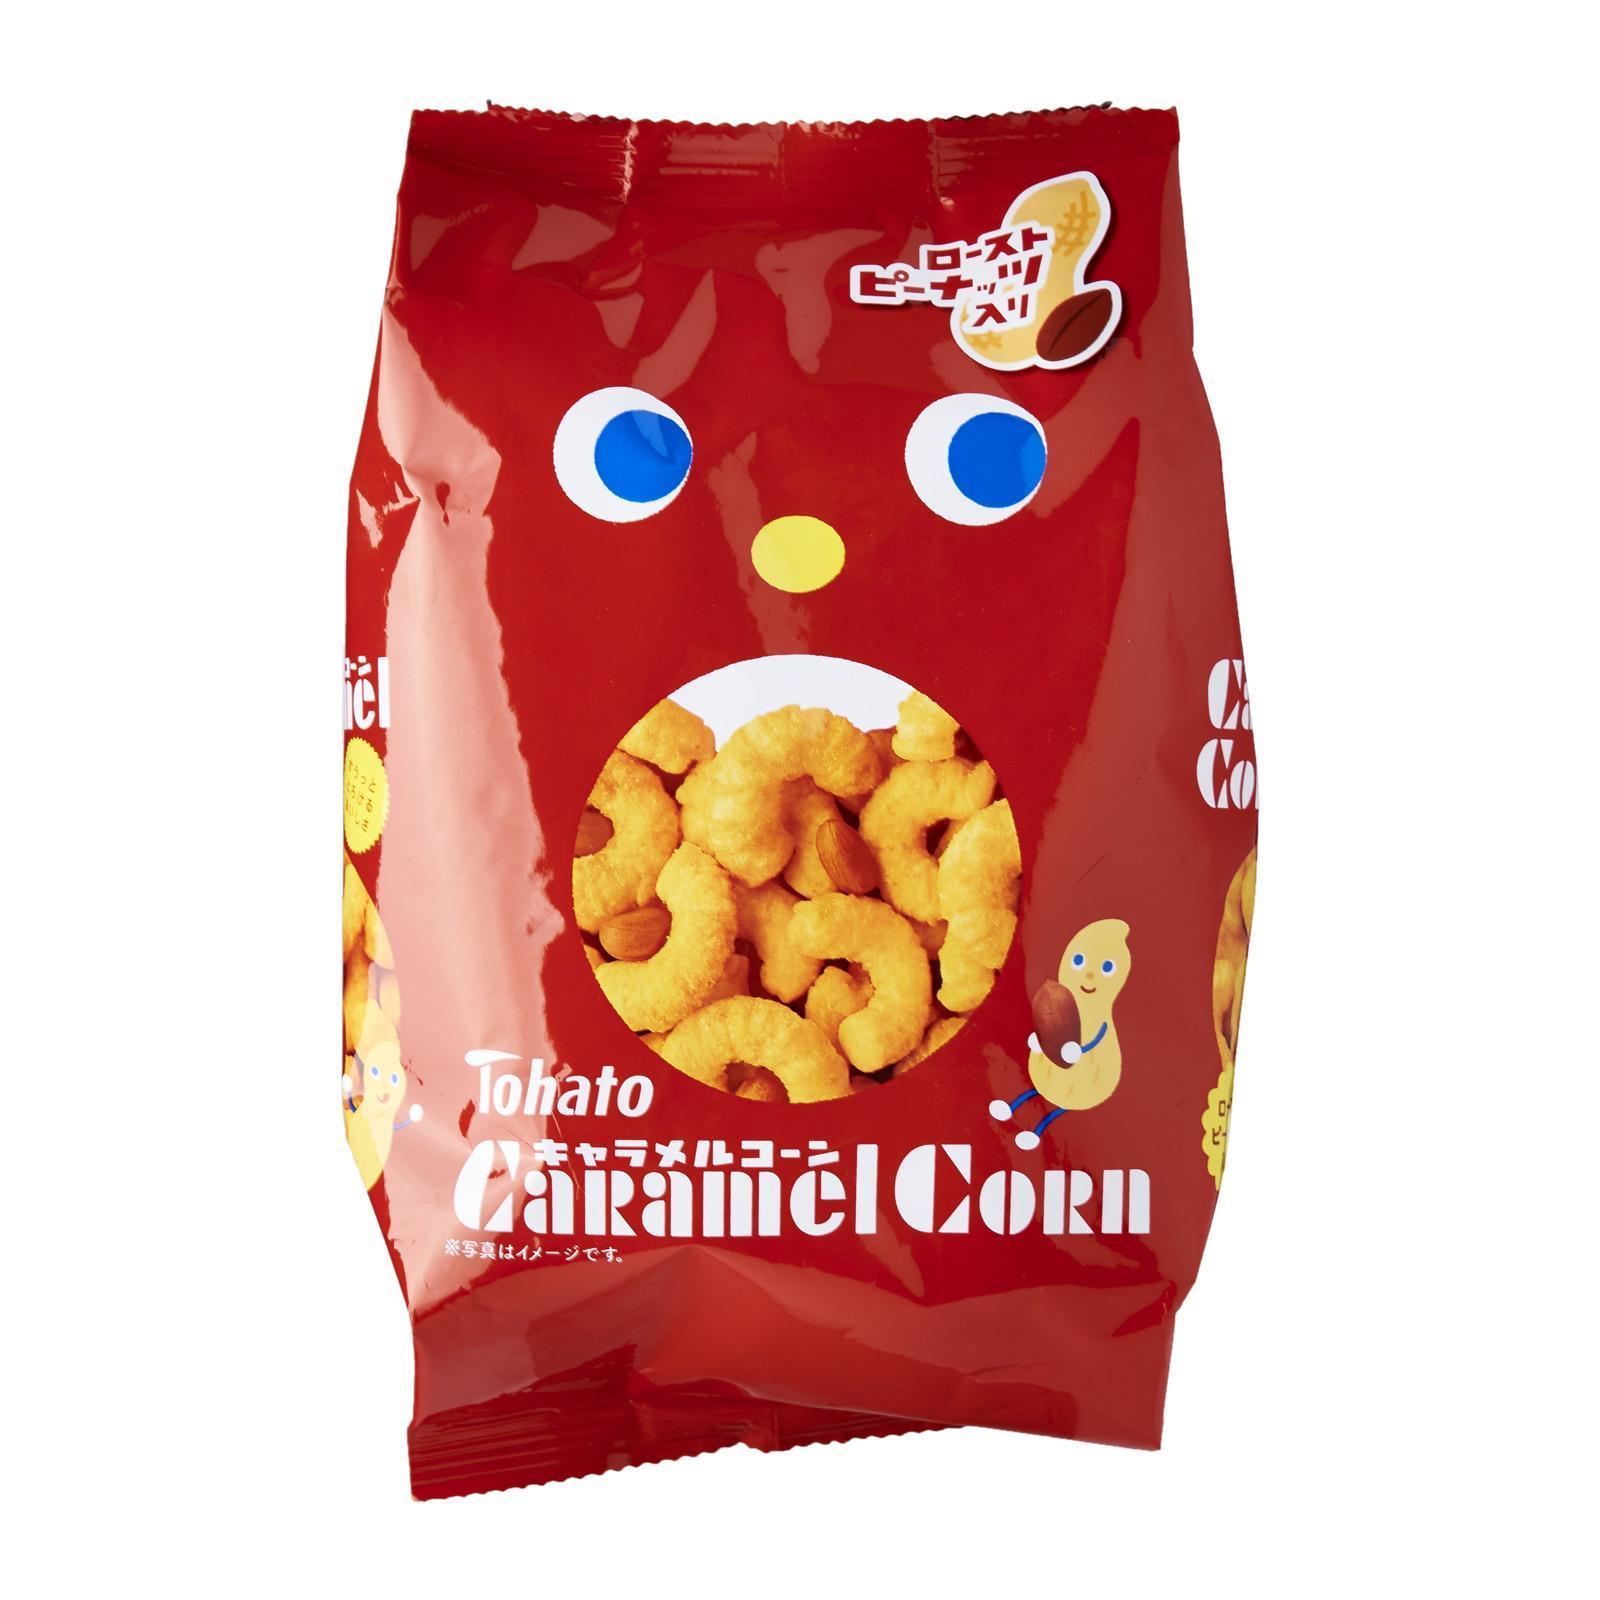 Tohato Original Caramel Corn Snack